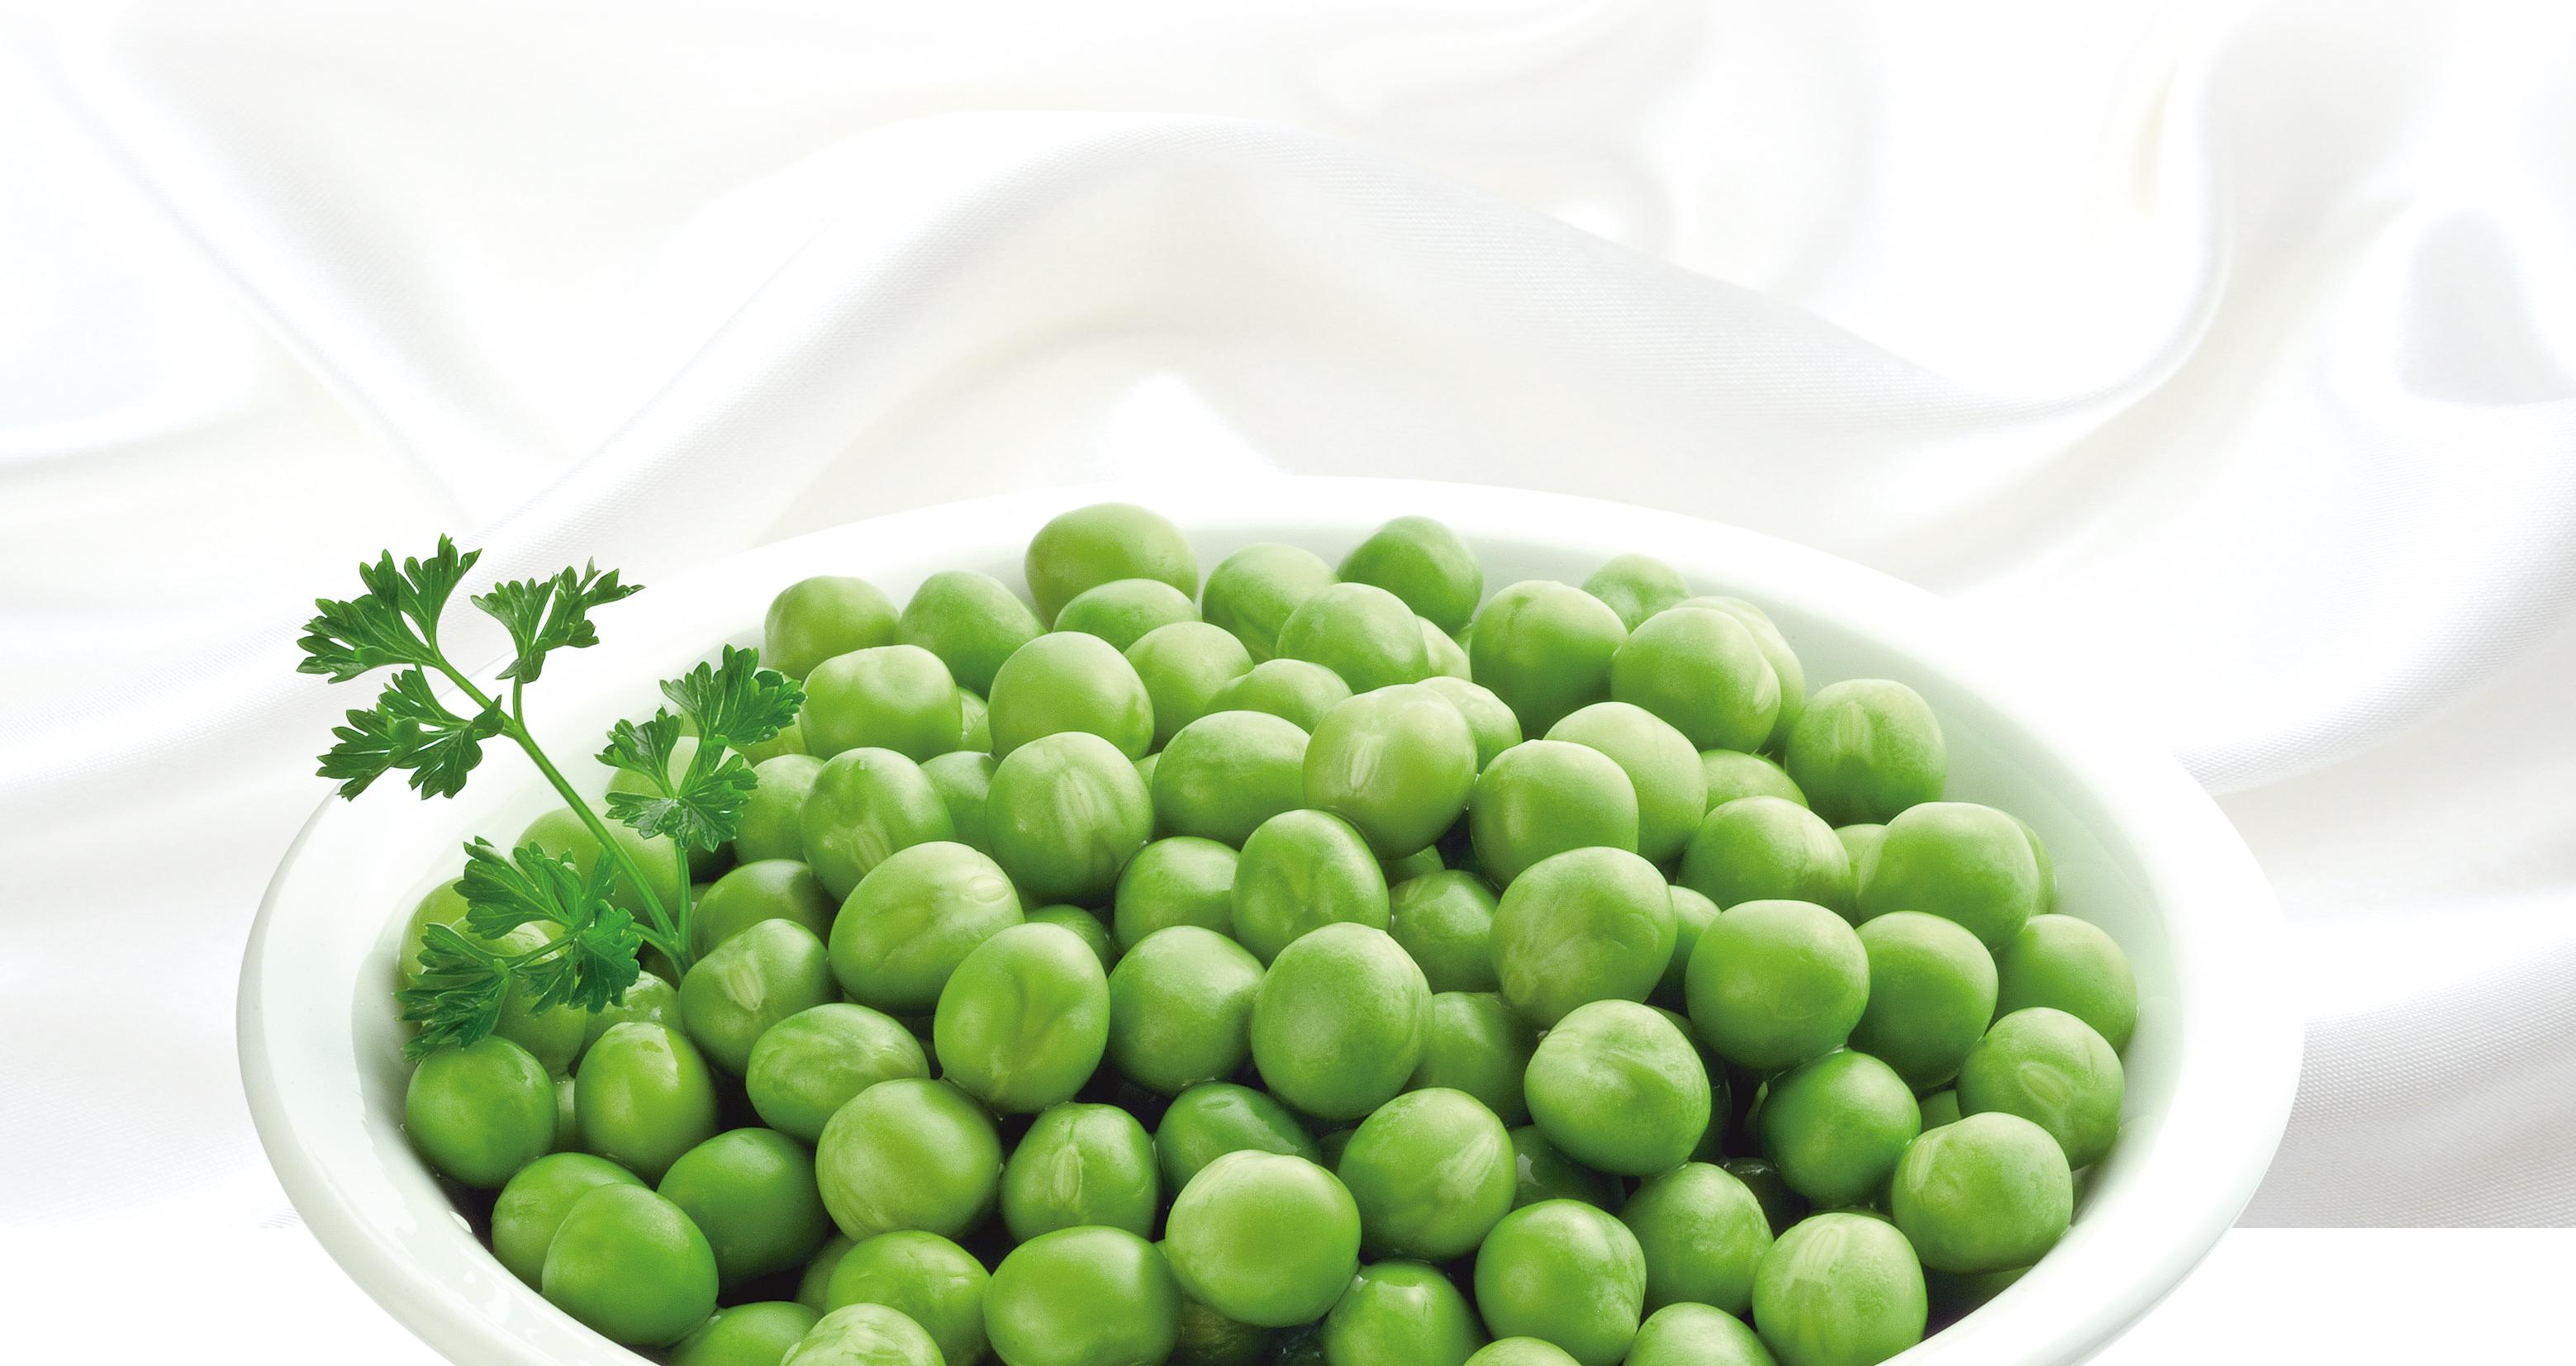 bulk-frozen-green-peas